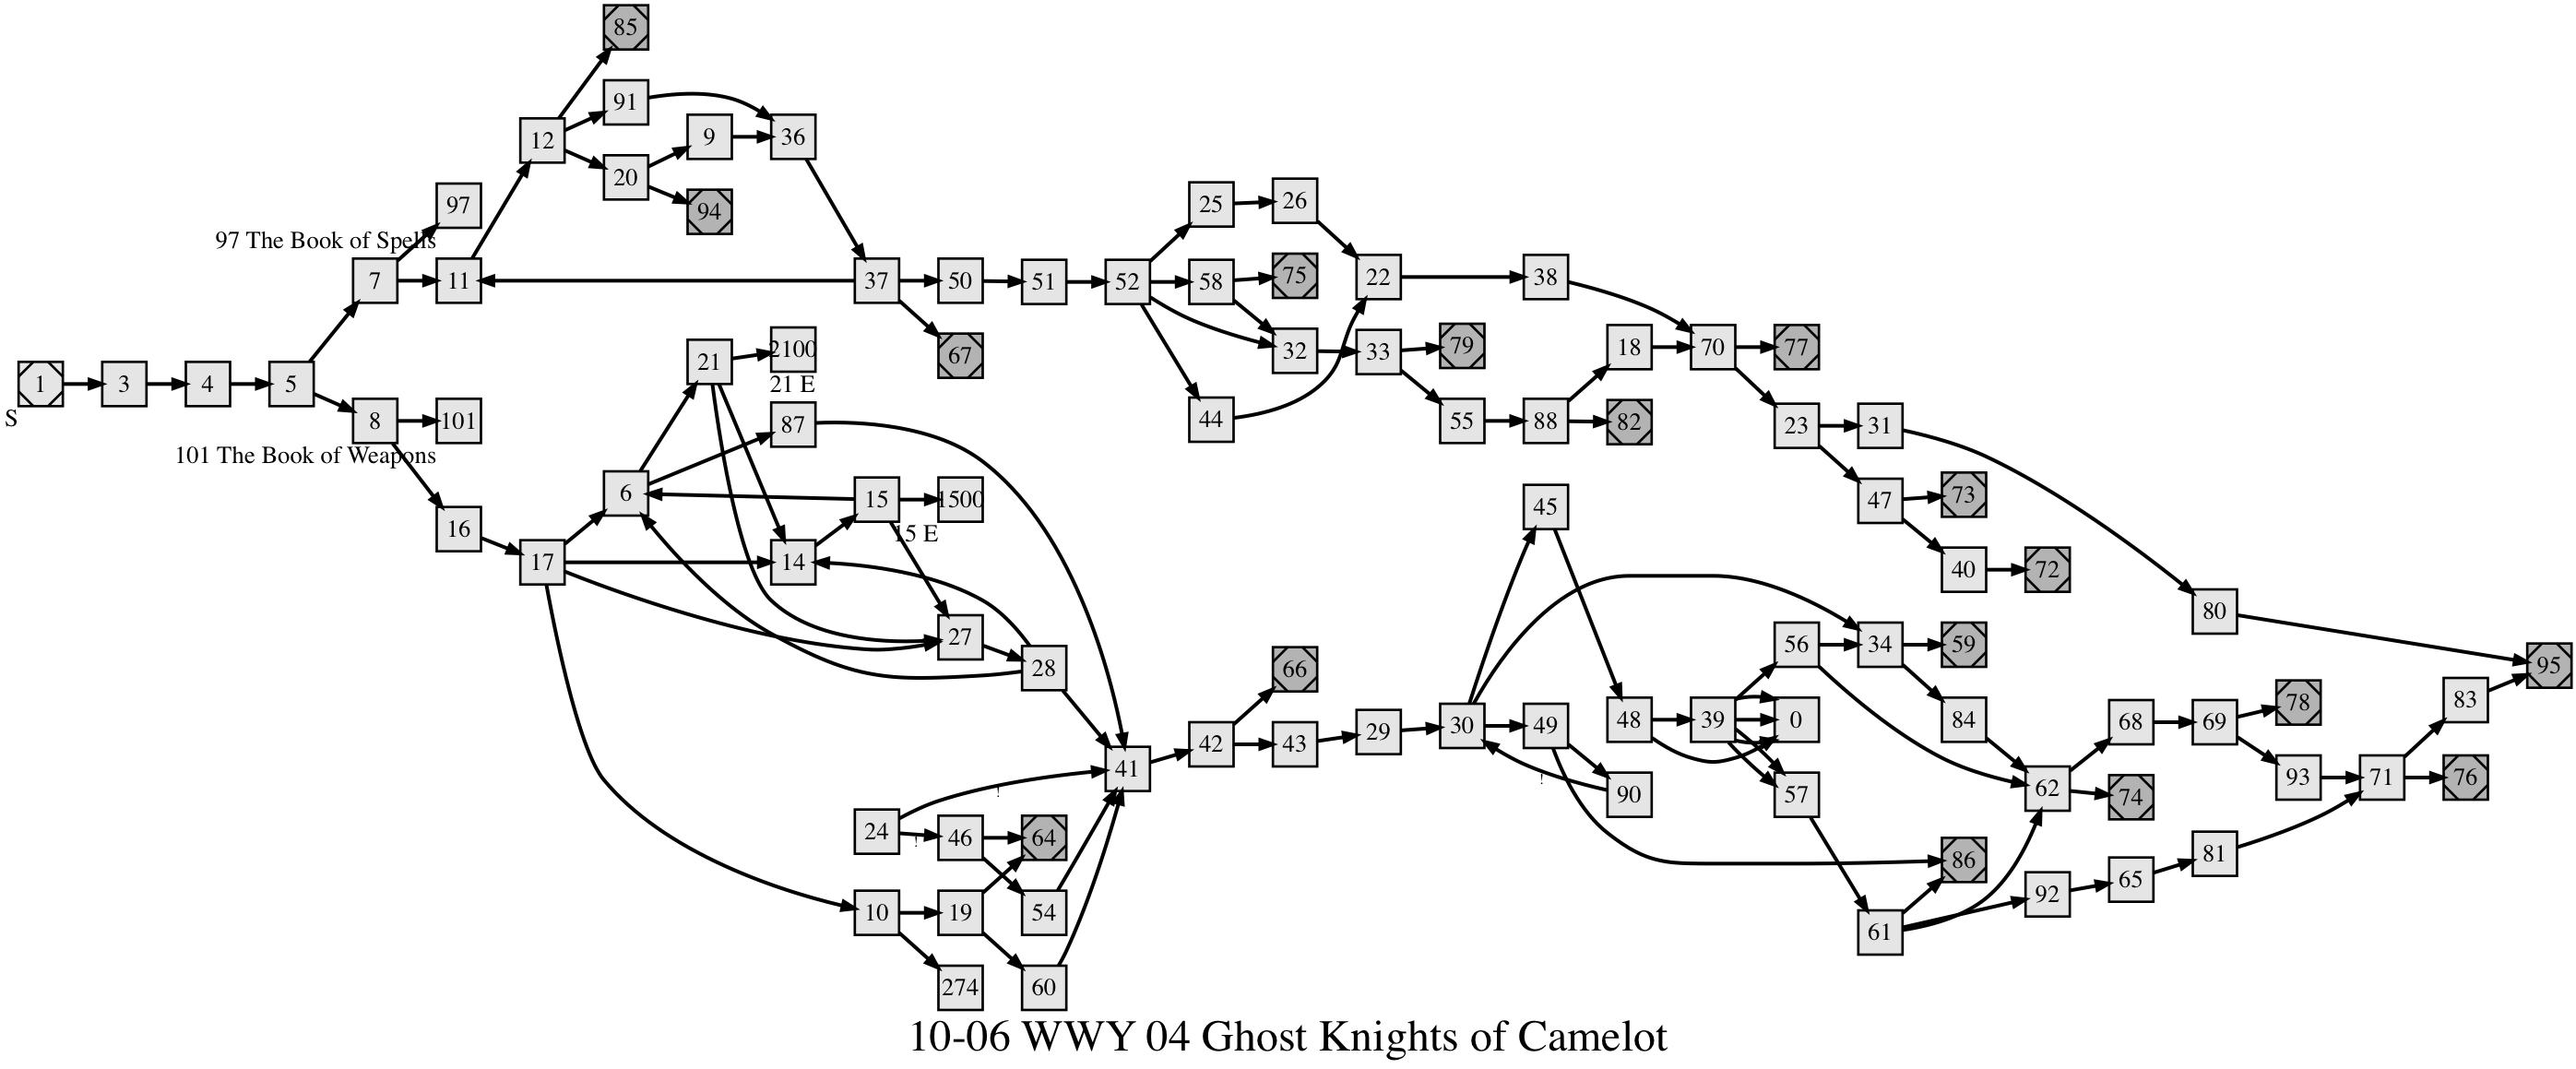 John Deere 4024 Engine Diagram Wiring Diagrams Schematics Jd 4320 Fuel Pump Coolant Flow Transverse